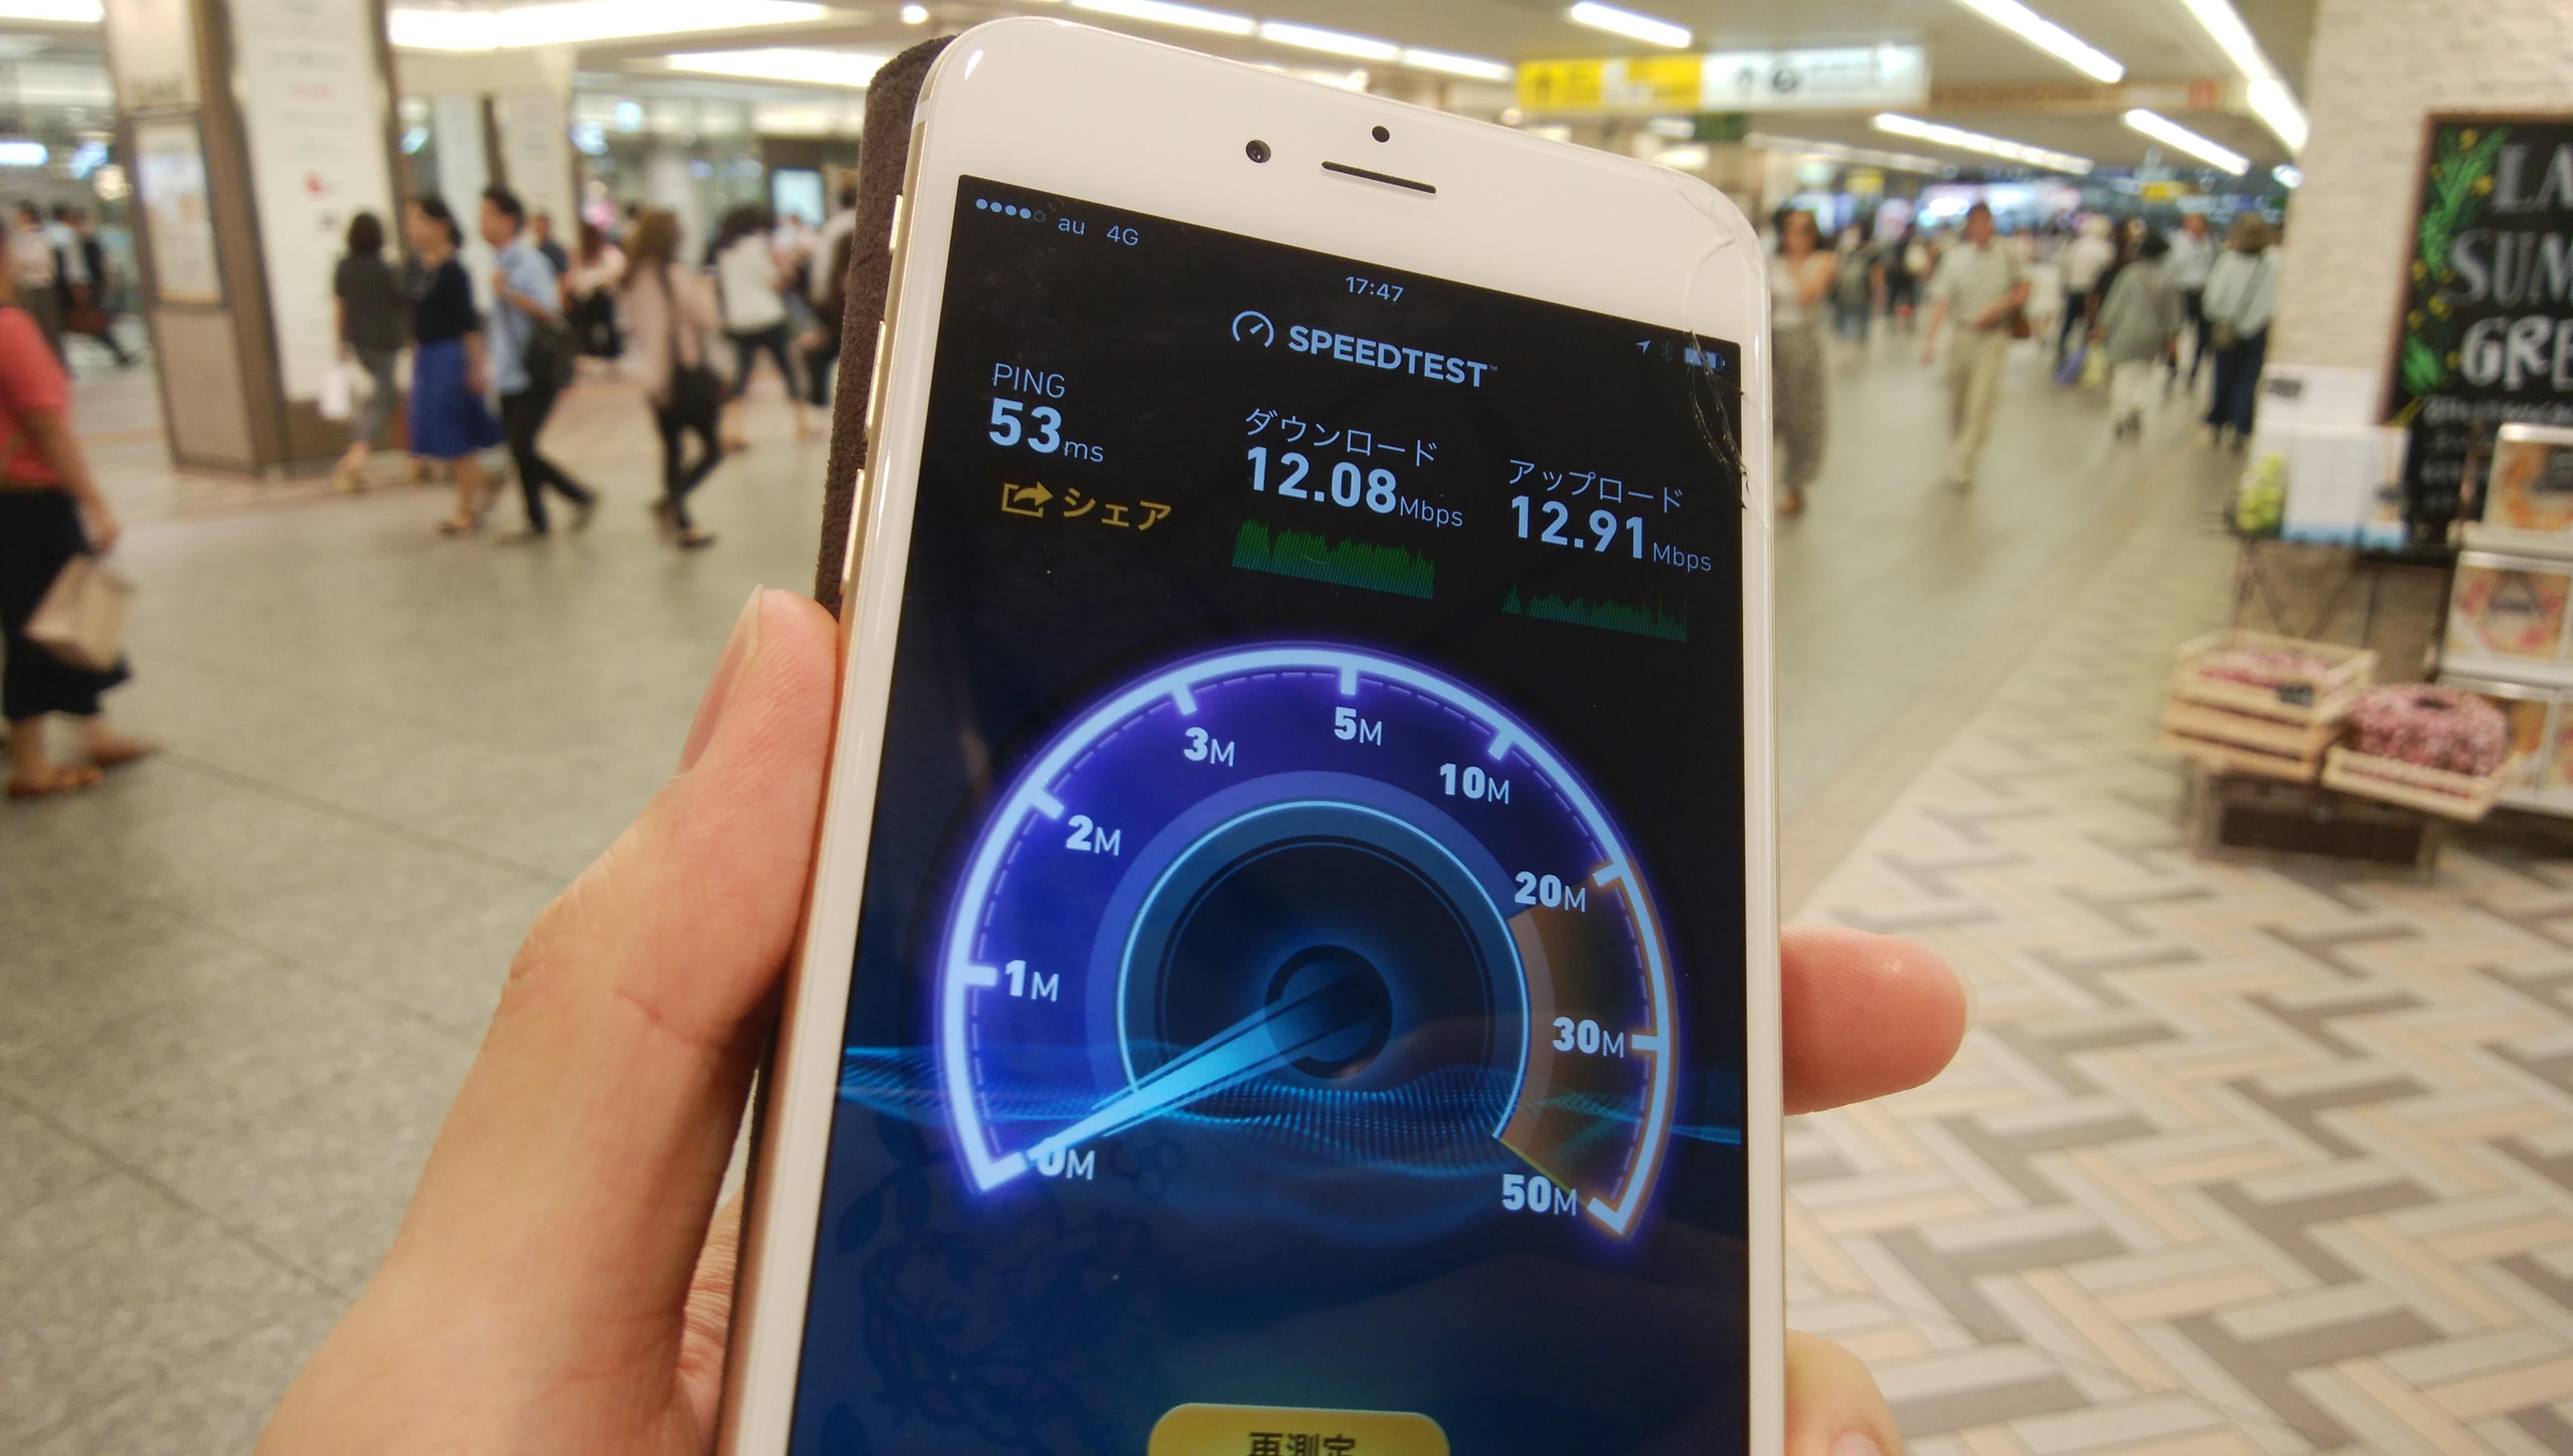 mineoAプランの通信速度